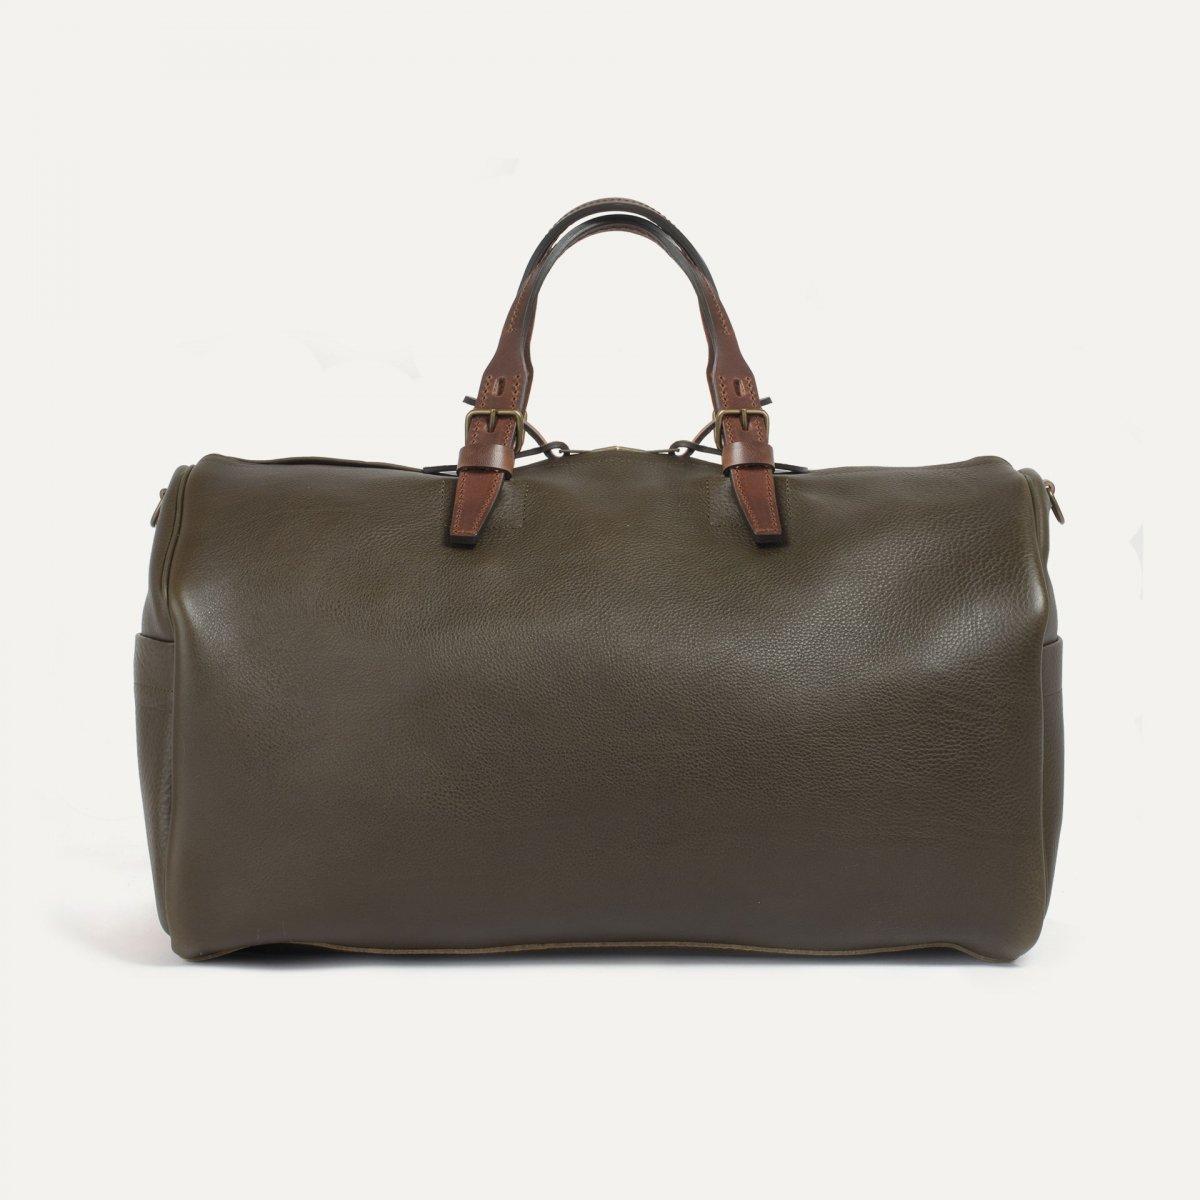 Hobo Travel bag - Khaki (image n°3)